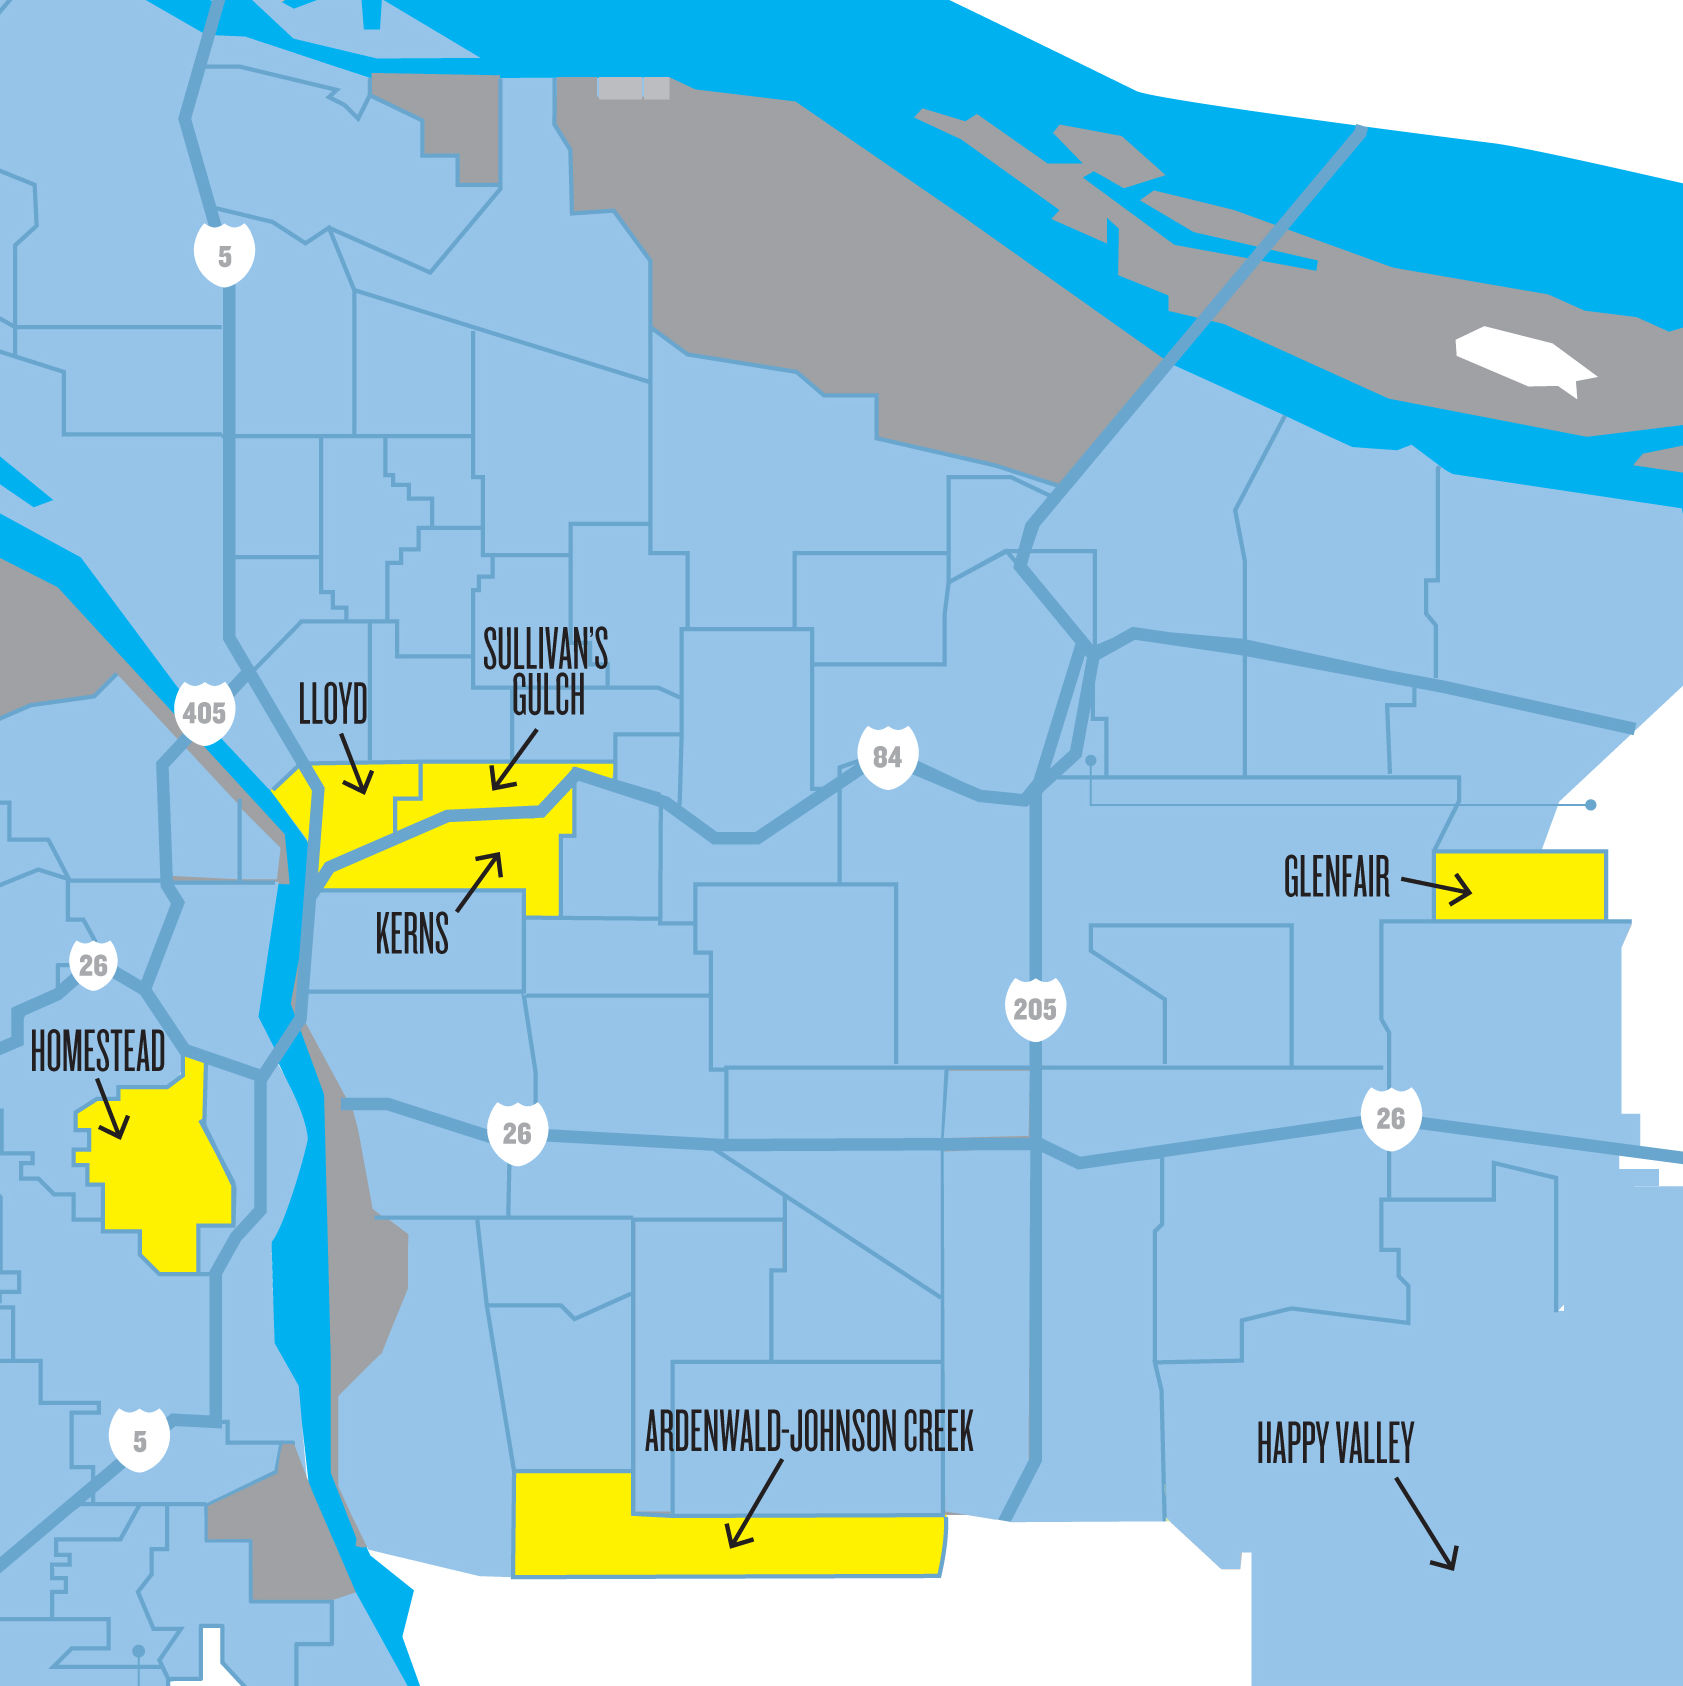 0418 real estate neighborhood map revised ov0bjc